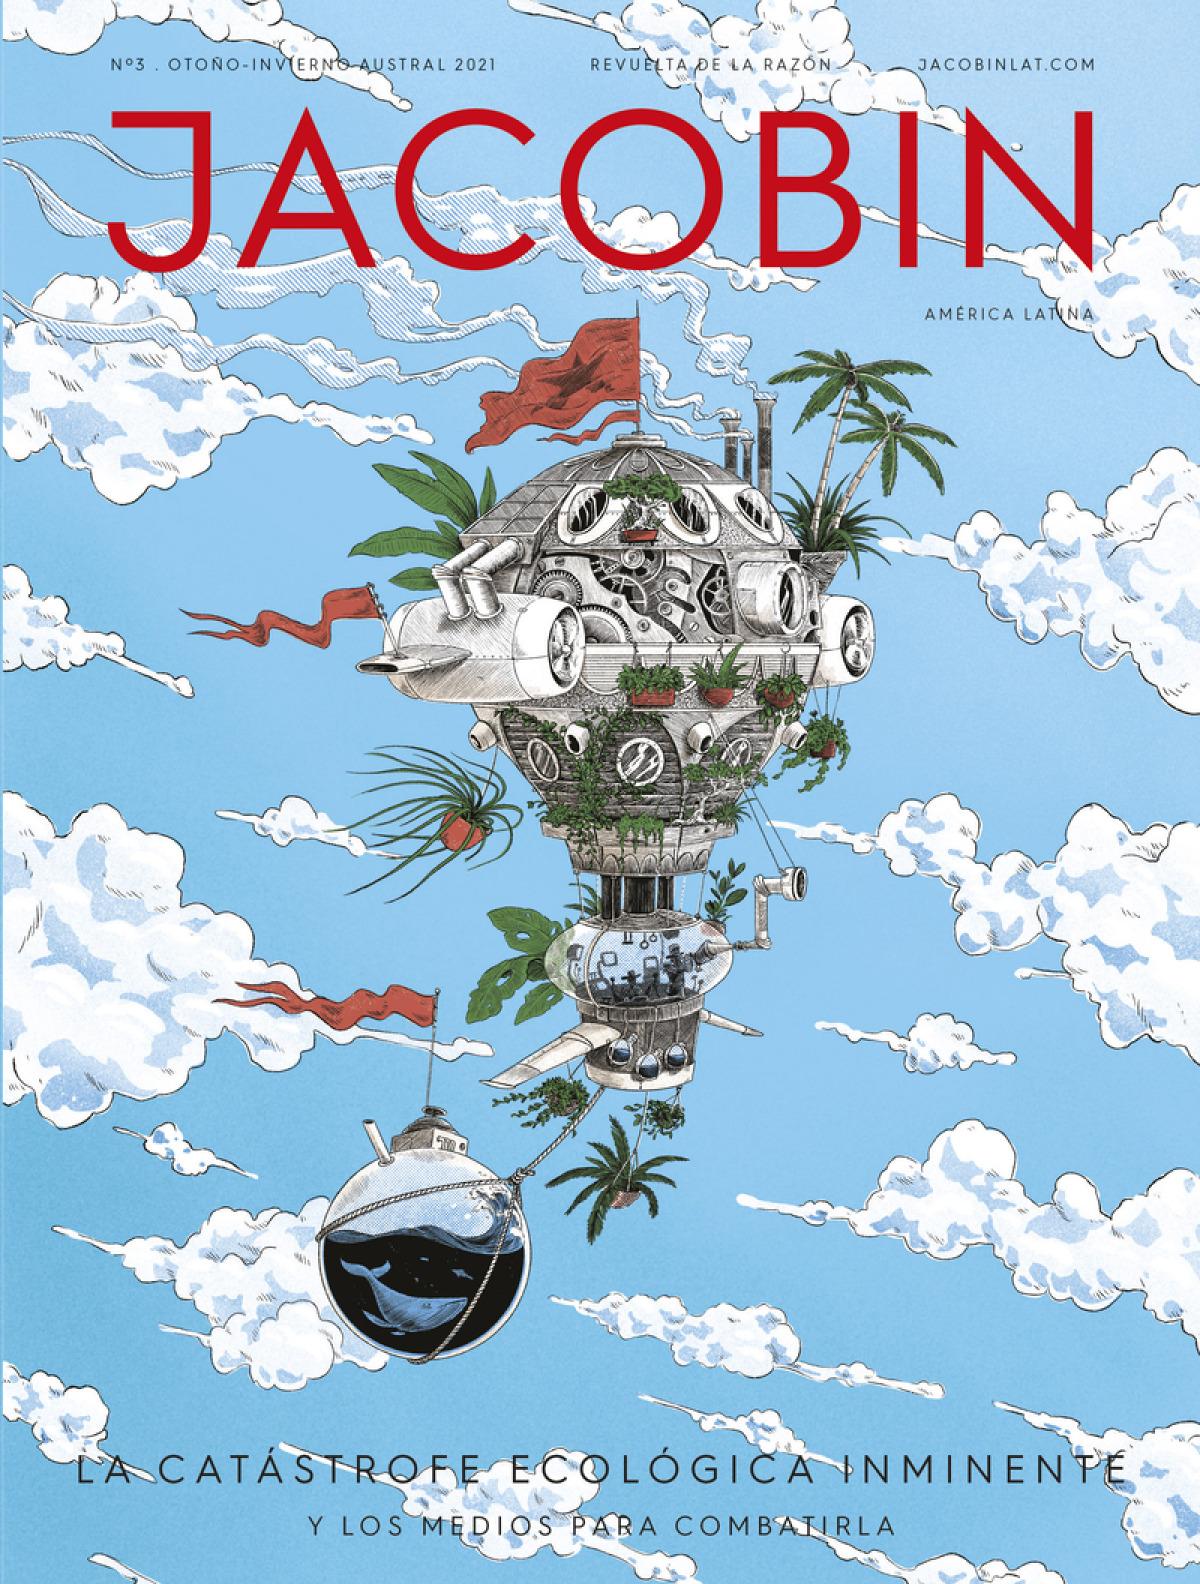 La catástrofe ecológica inminente. Jacobin América Latina #3